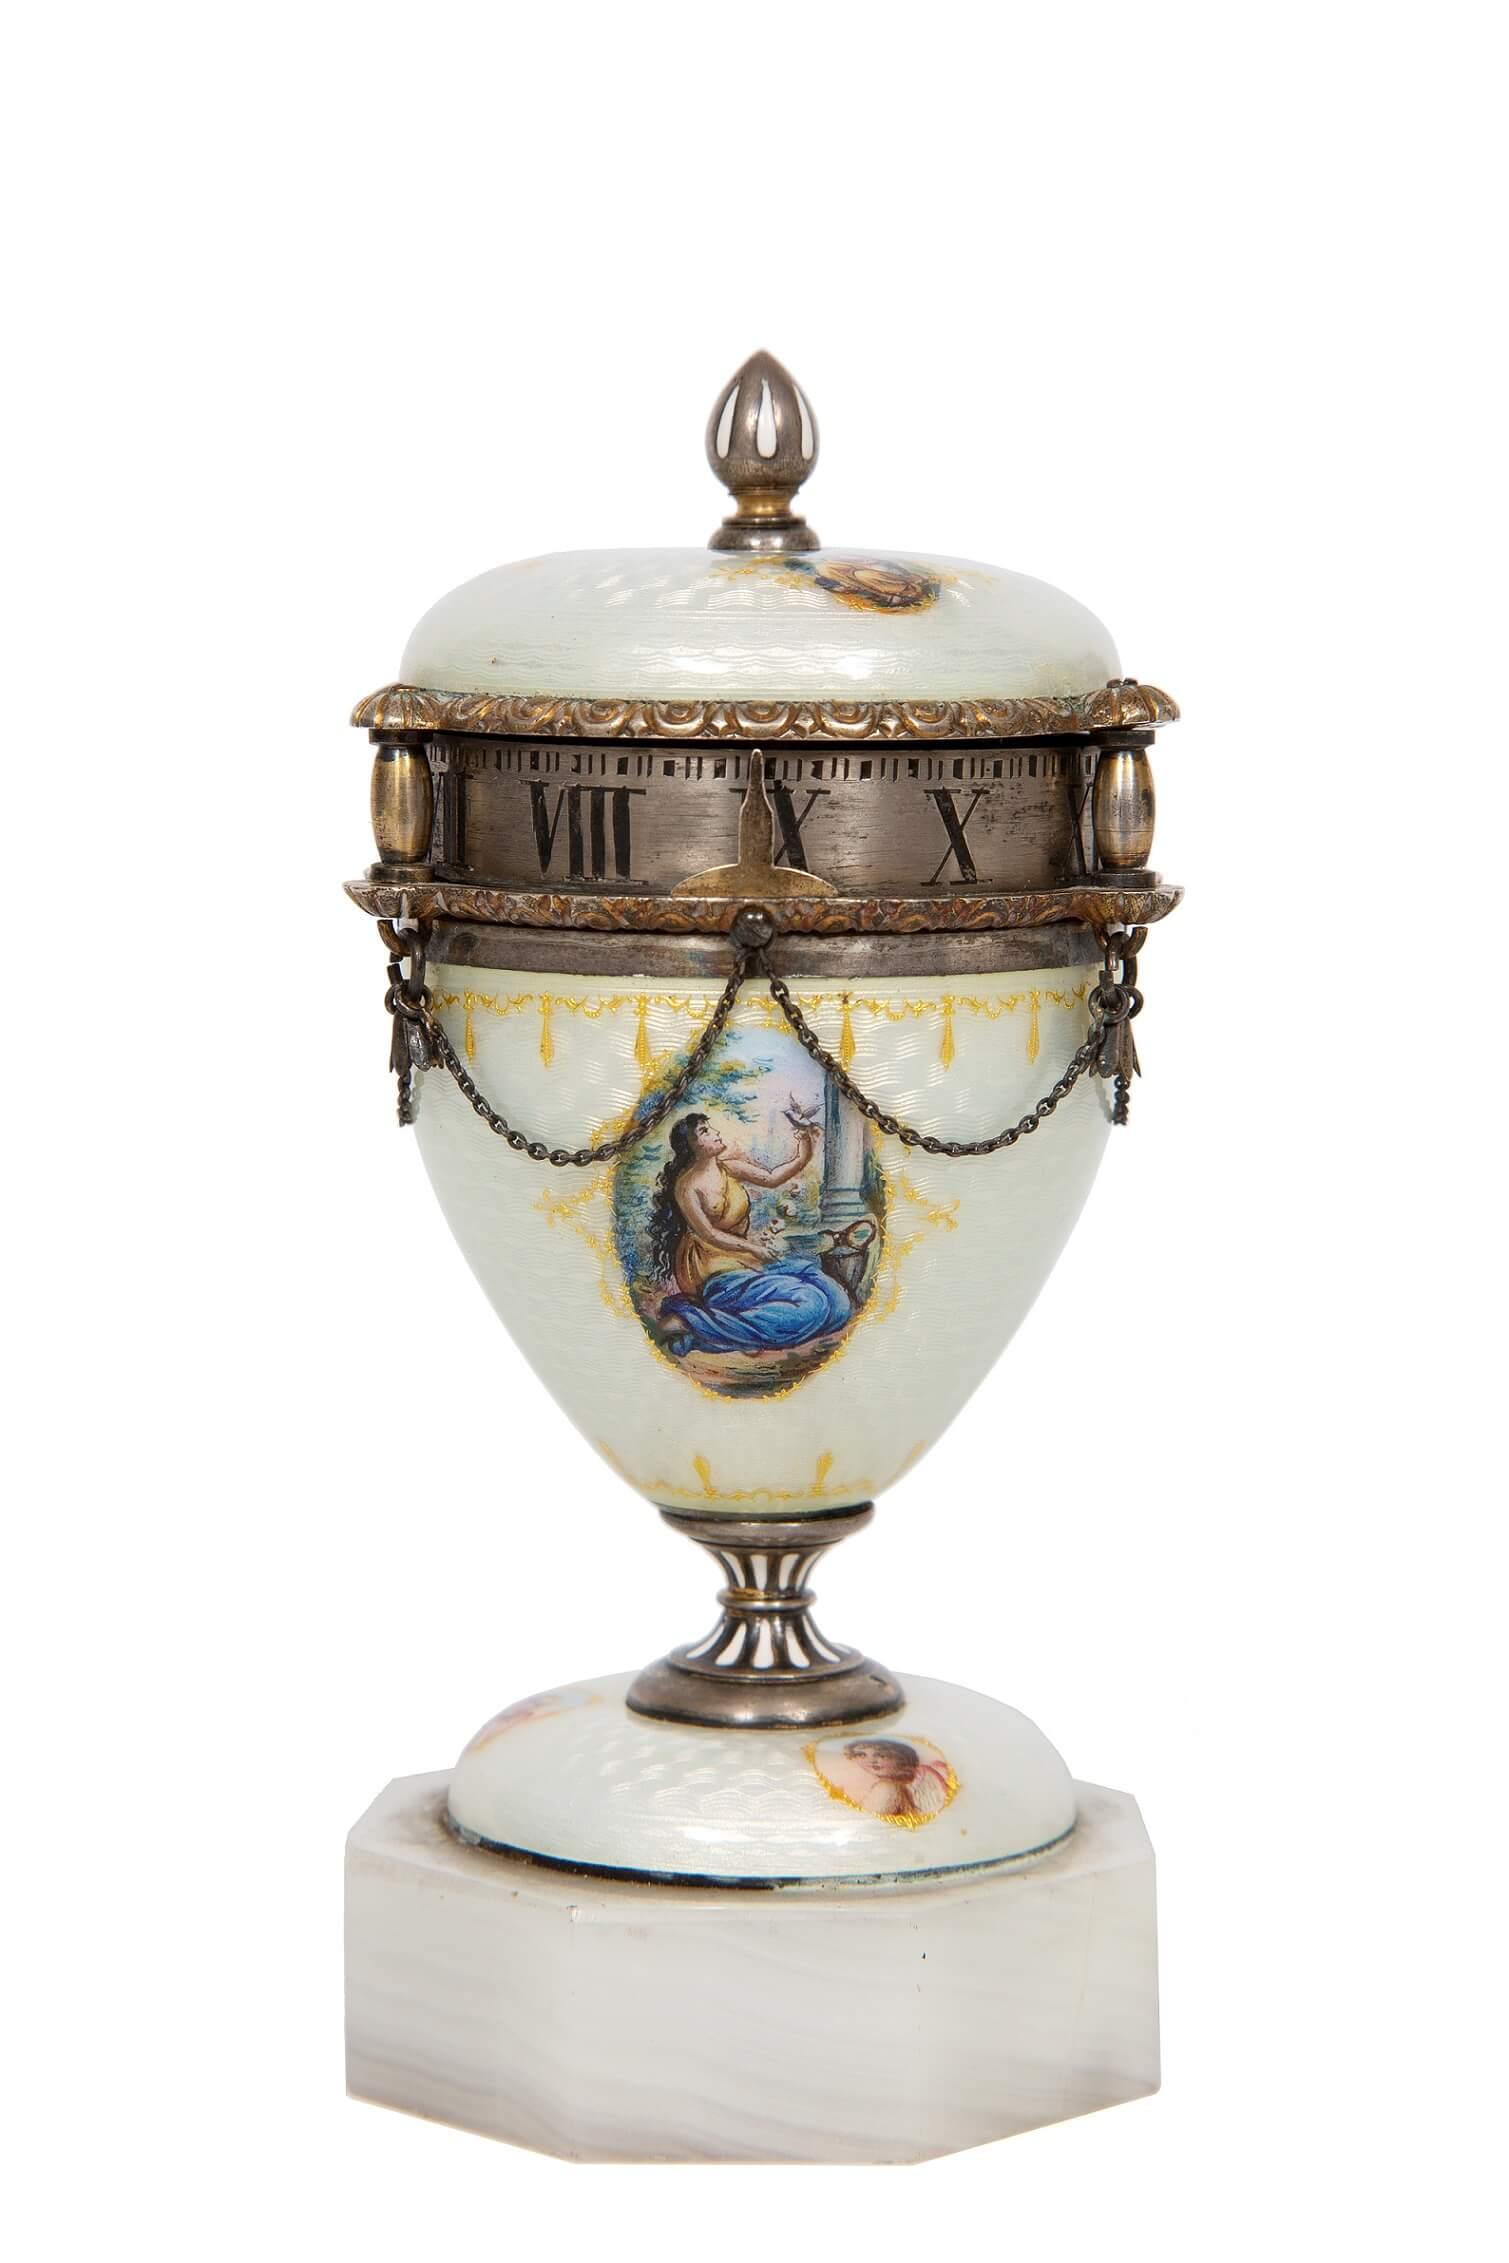 Swiss-miniature-silver-guilloche-translucent-enamel-cercle-tournant-clock